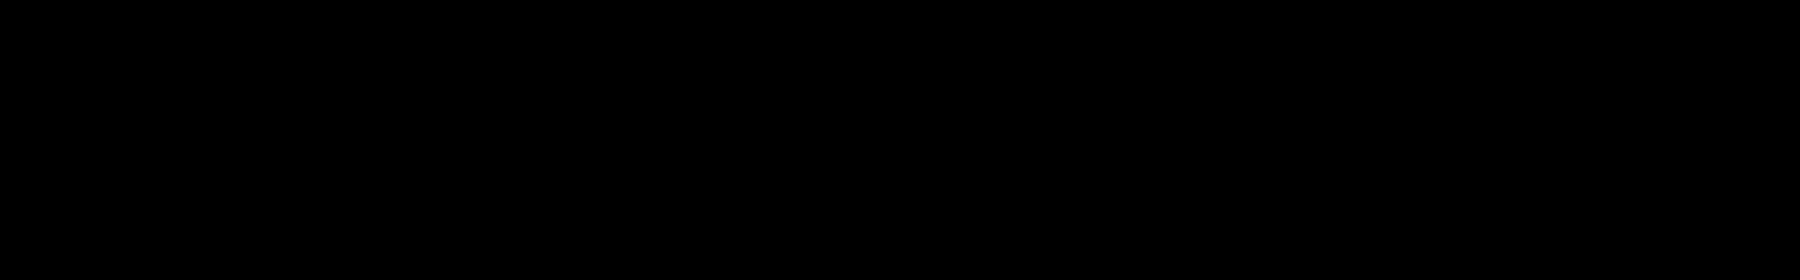 SINEE - Polychrome Vibes audio waveform